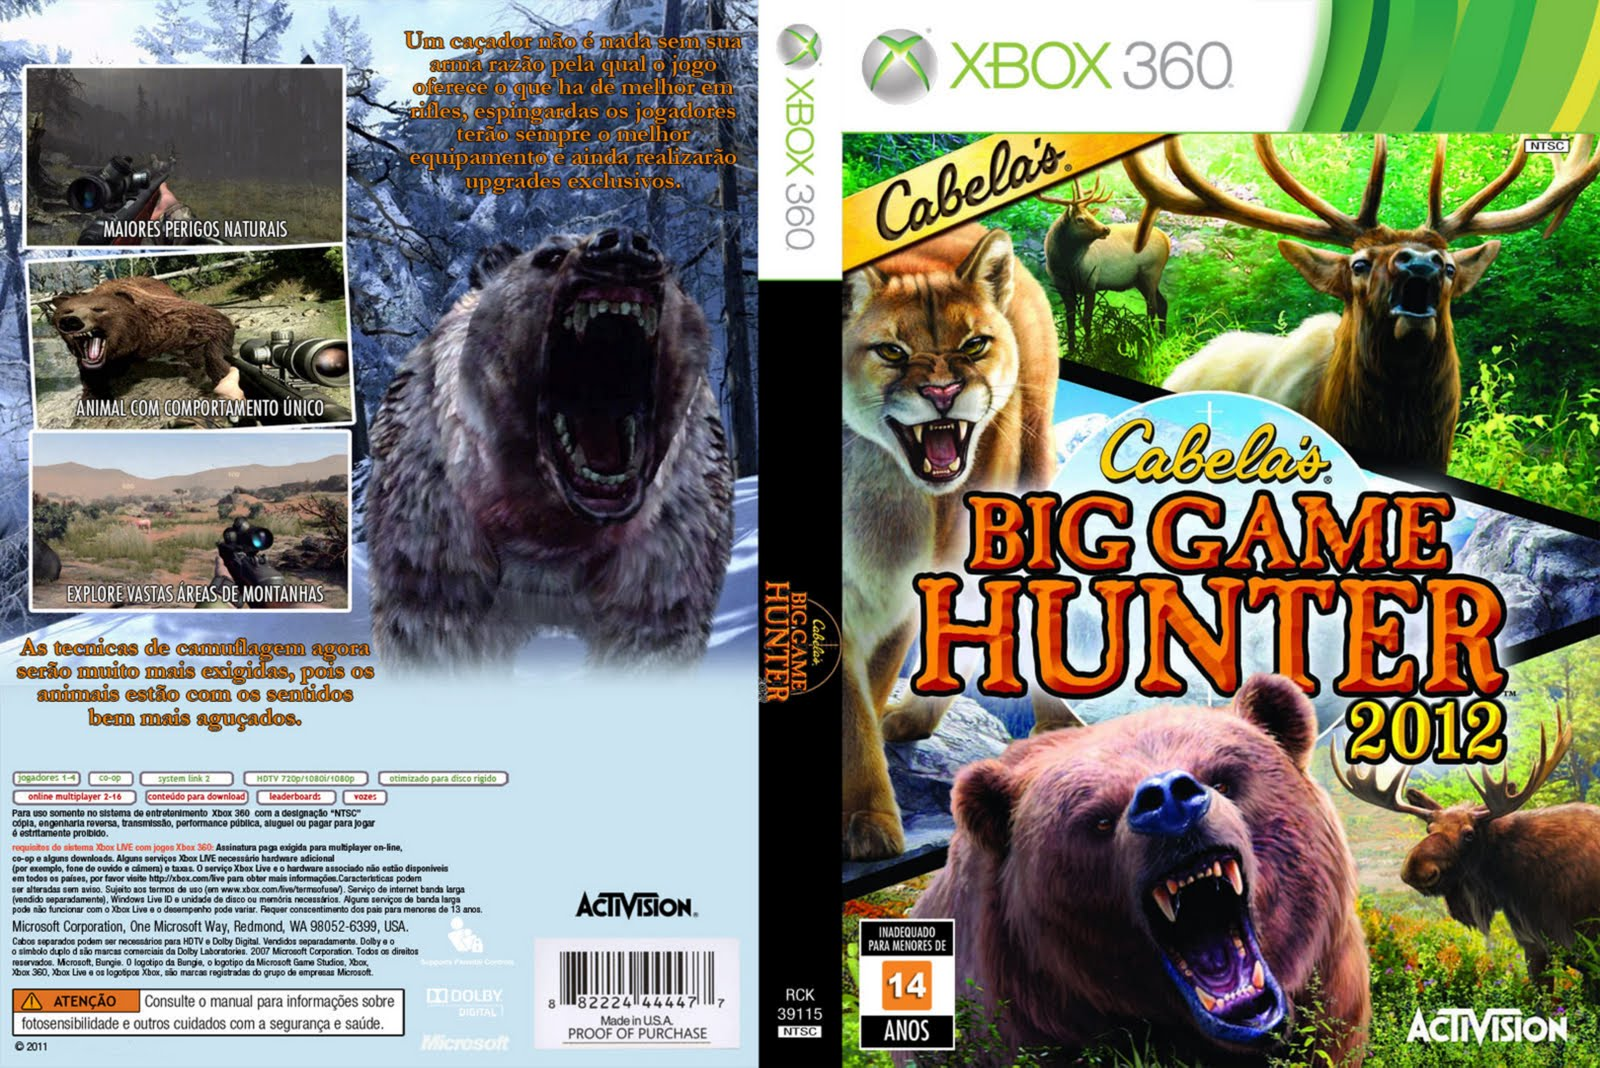 MULTI] Cabelas.Big.Game.Hunter.2012.XBOX360-COMPLEX